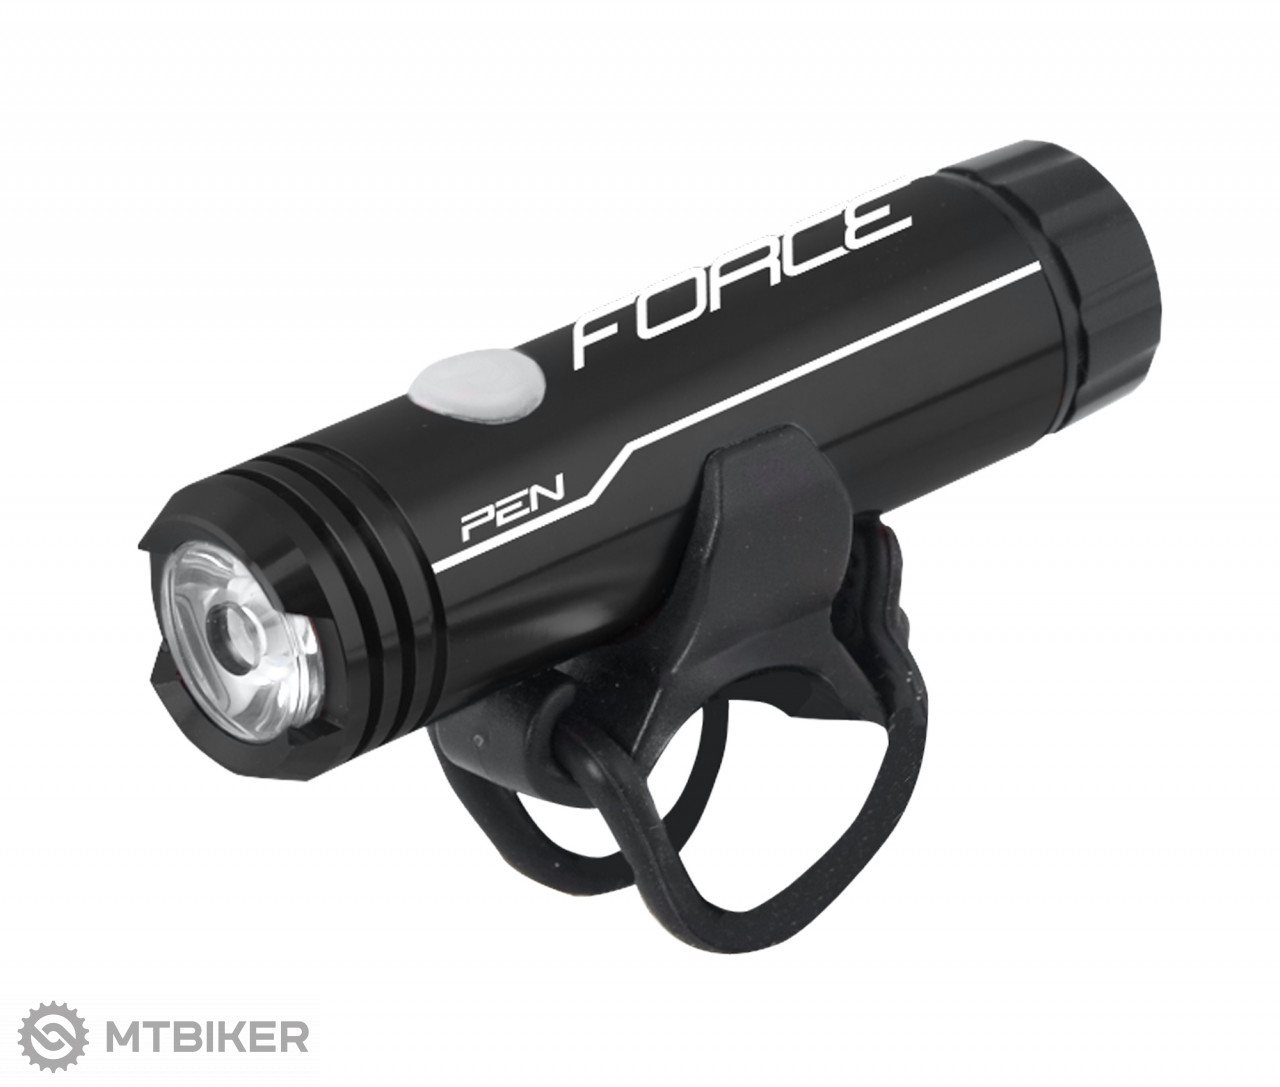 Force Pen predné svetlo USB 200LM 1 LED dióda